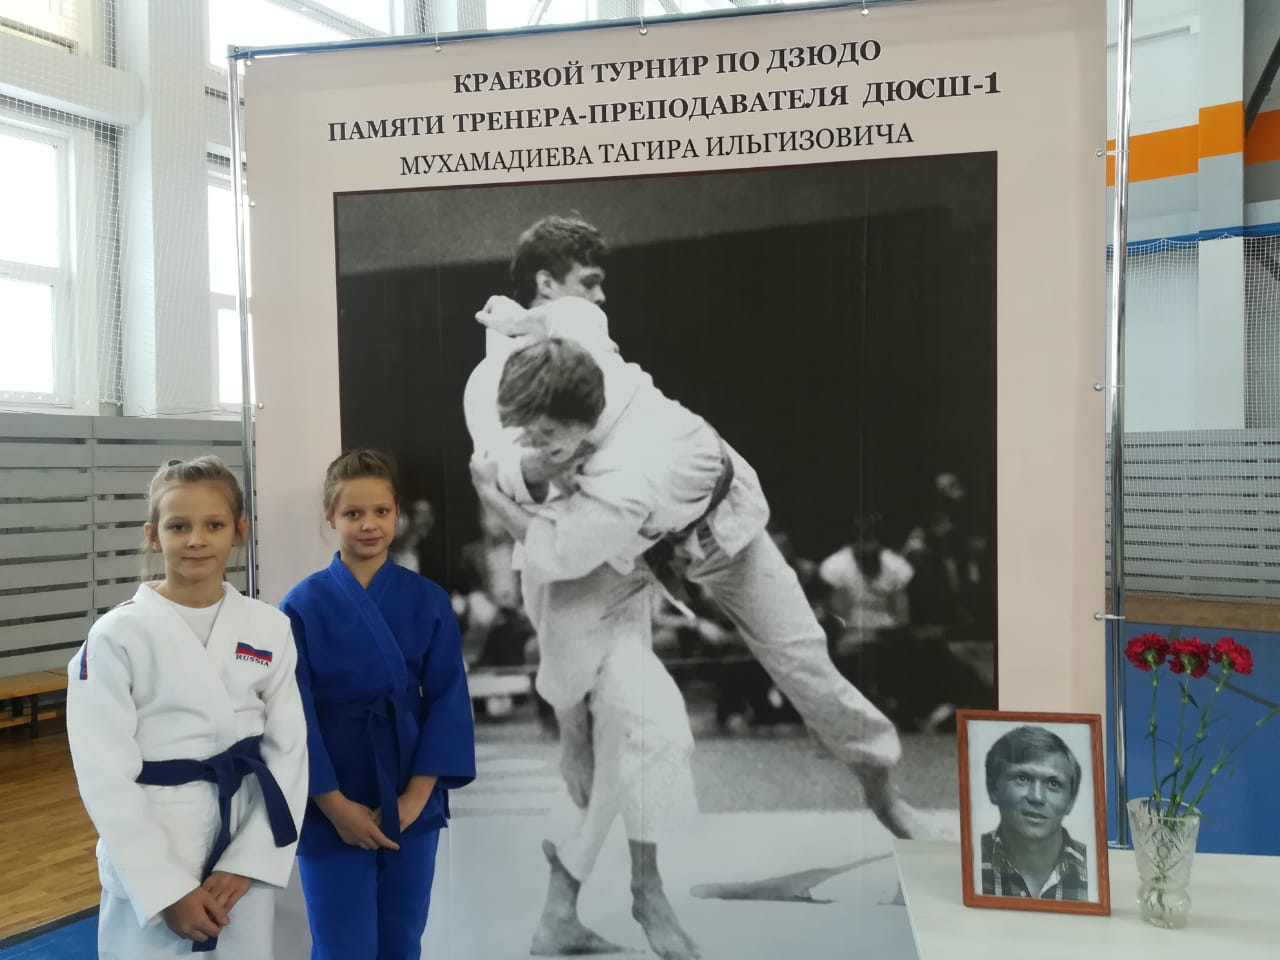 Краевой турнир по дзюдо памяти Т.И. Мухамадиева